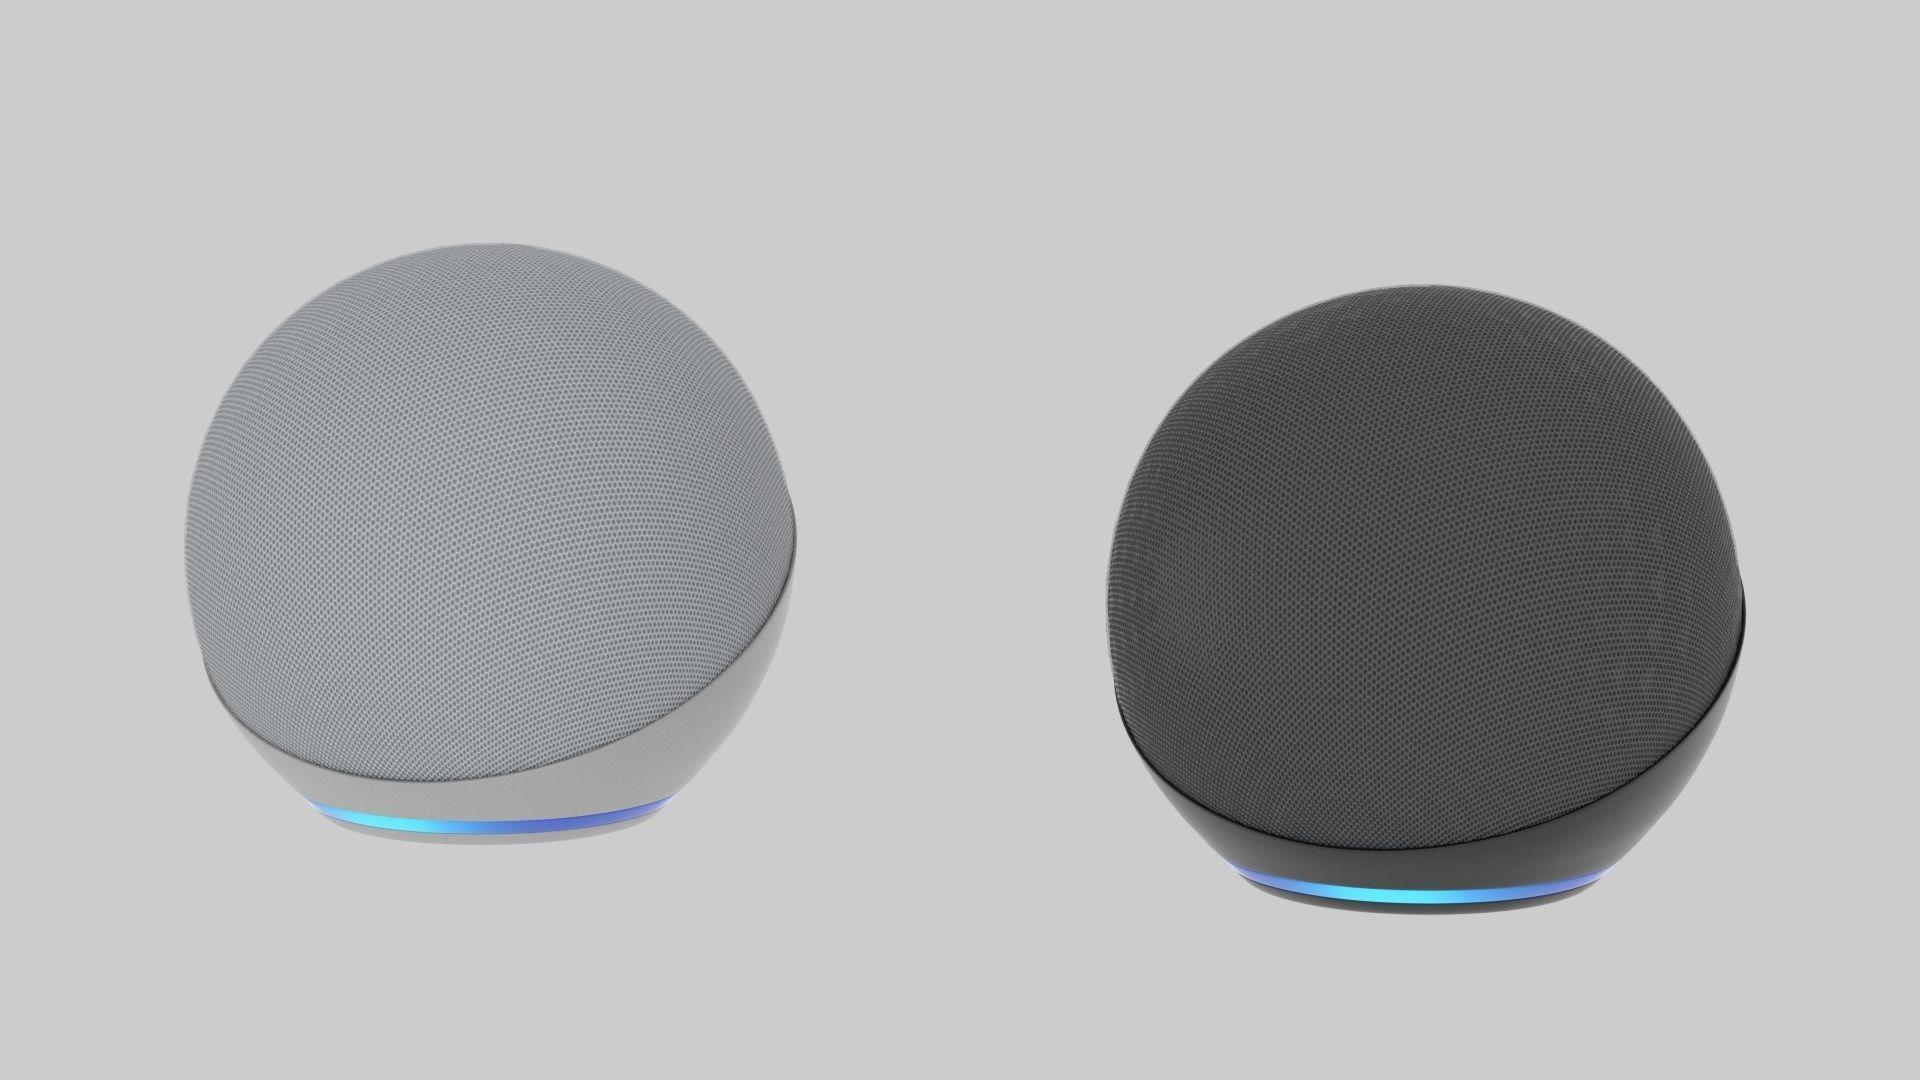 Echo dot 4th generation smart speaker with Alexa